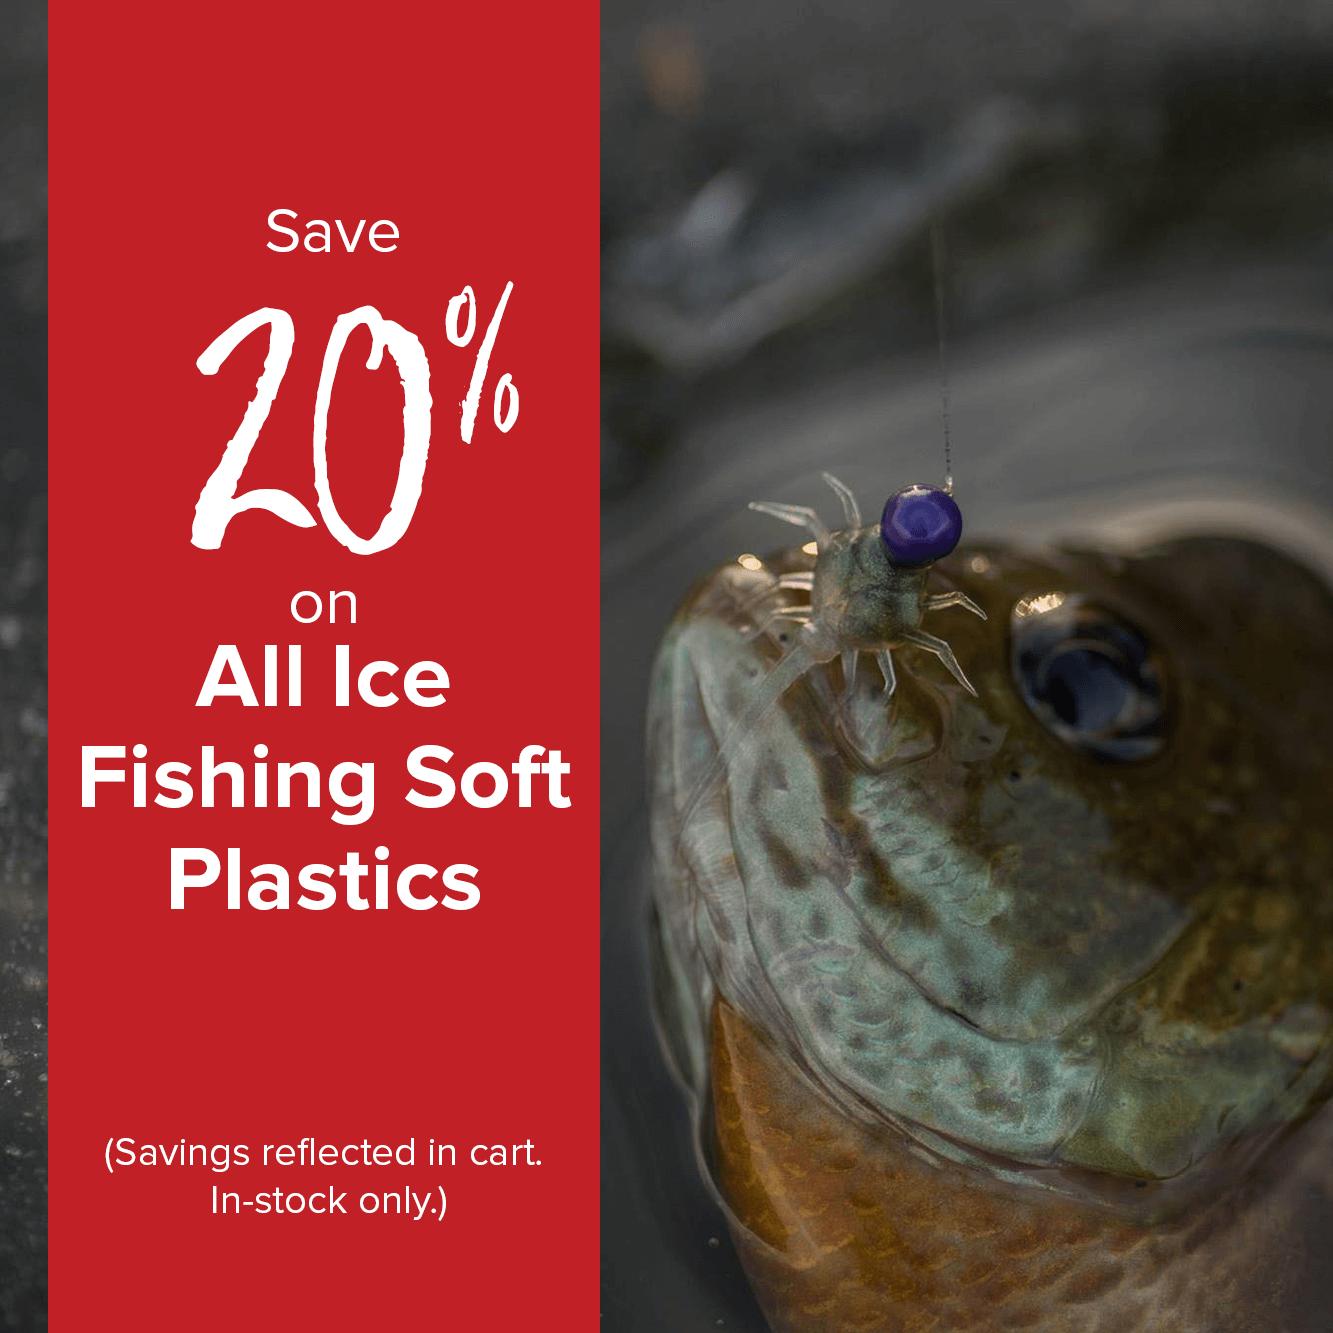 Save 20% on all Ice Fishing Soft Plastics